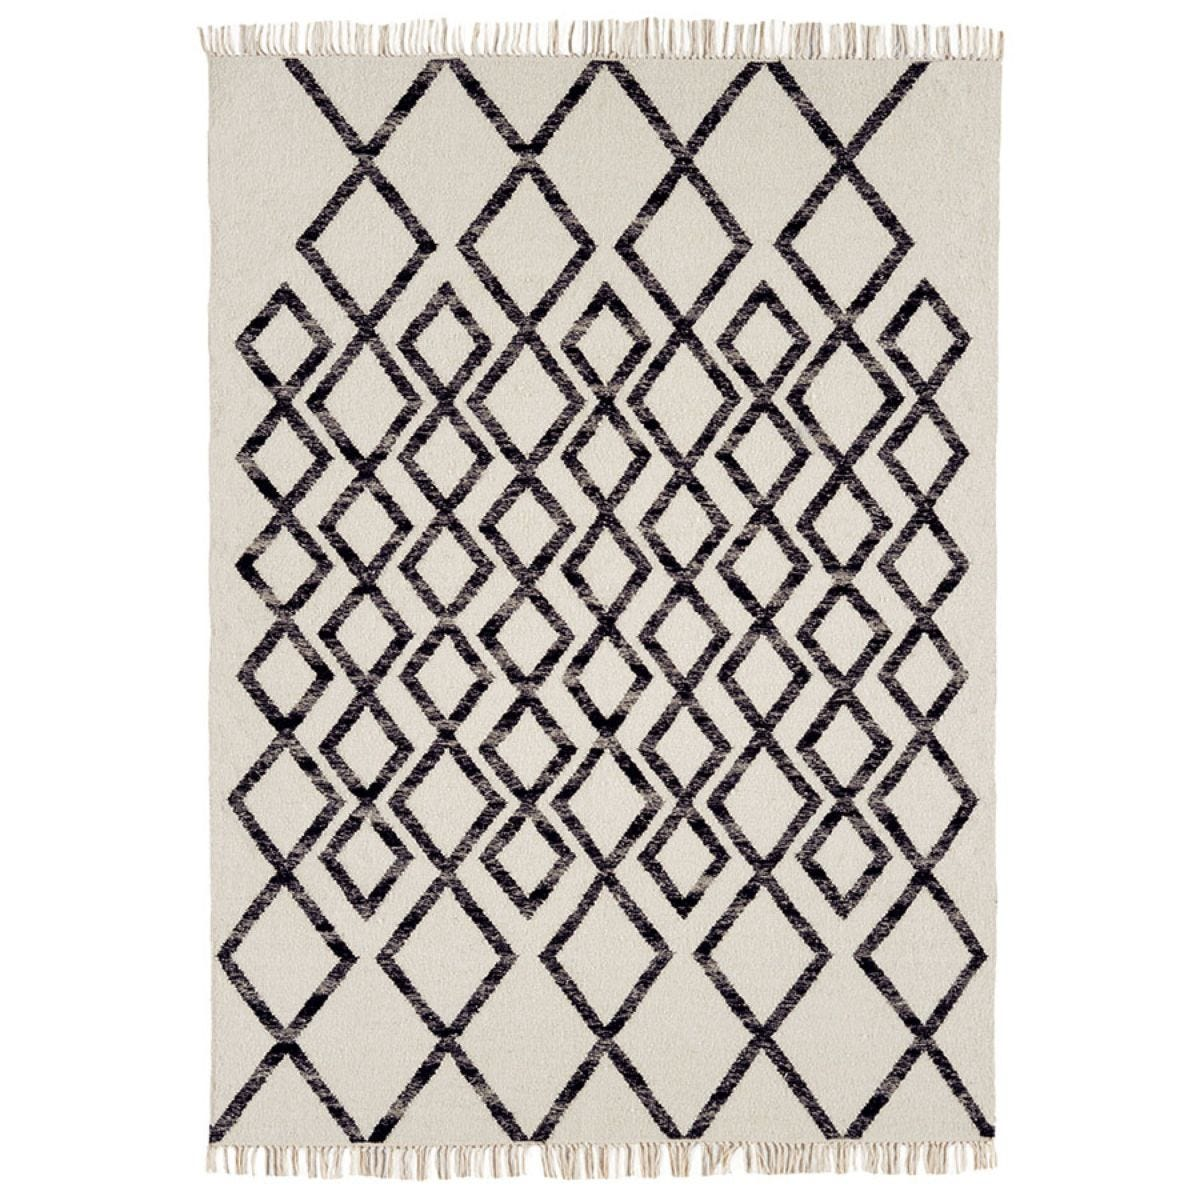 Asiatic Hackney Rug, 160 x 230cm - Black